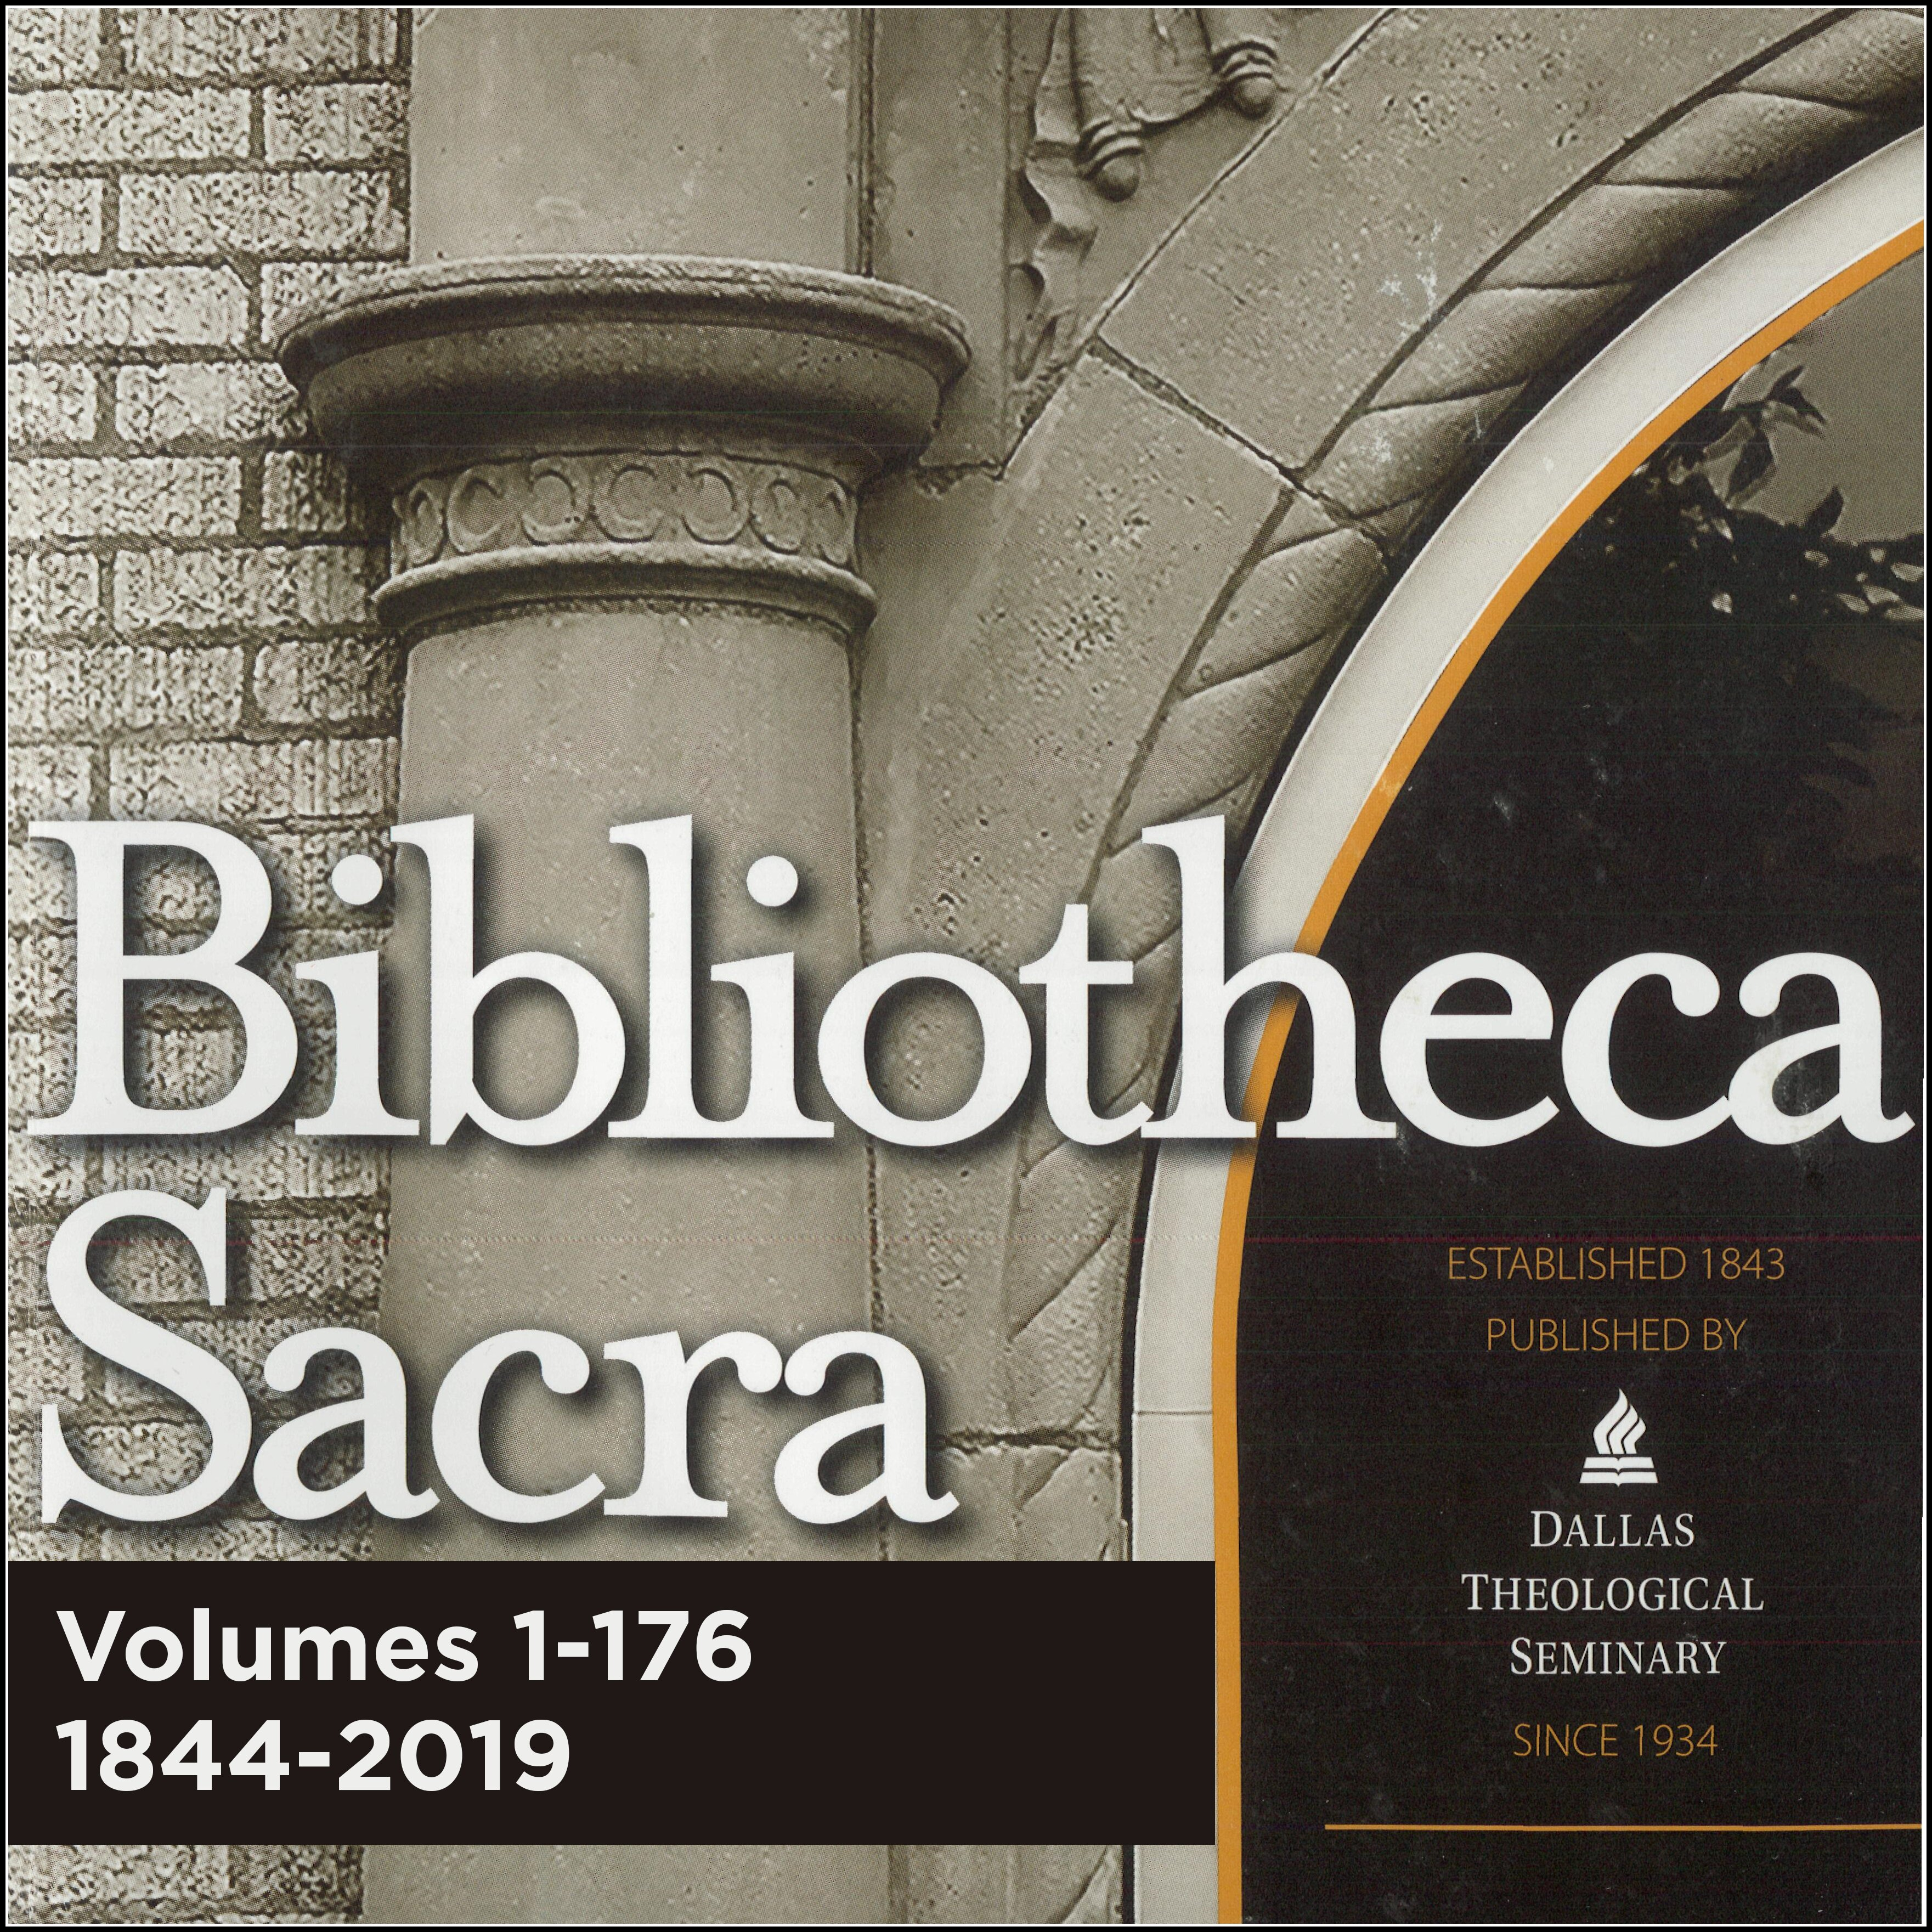 Bibliotheca Sacra, Vols. 1-176